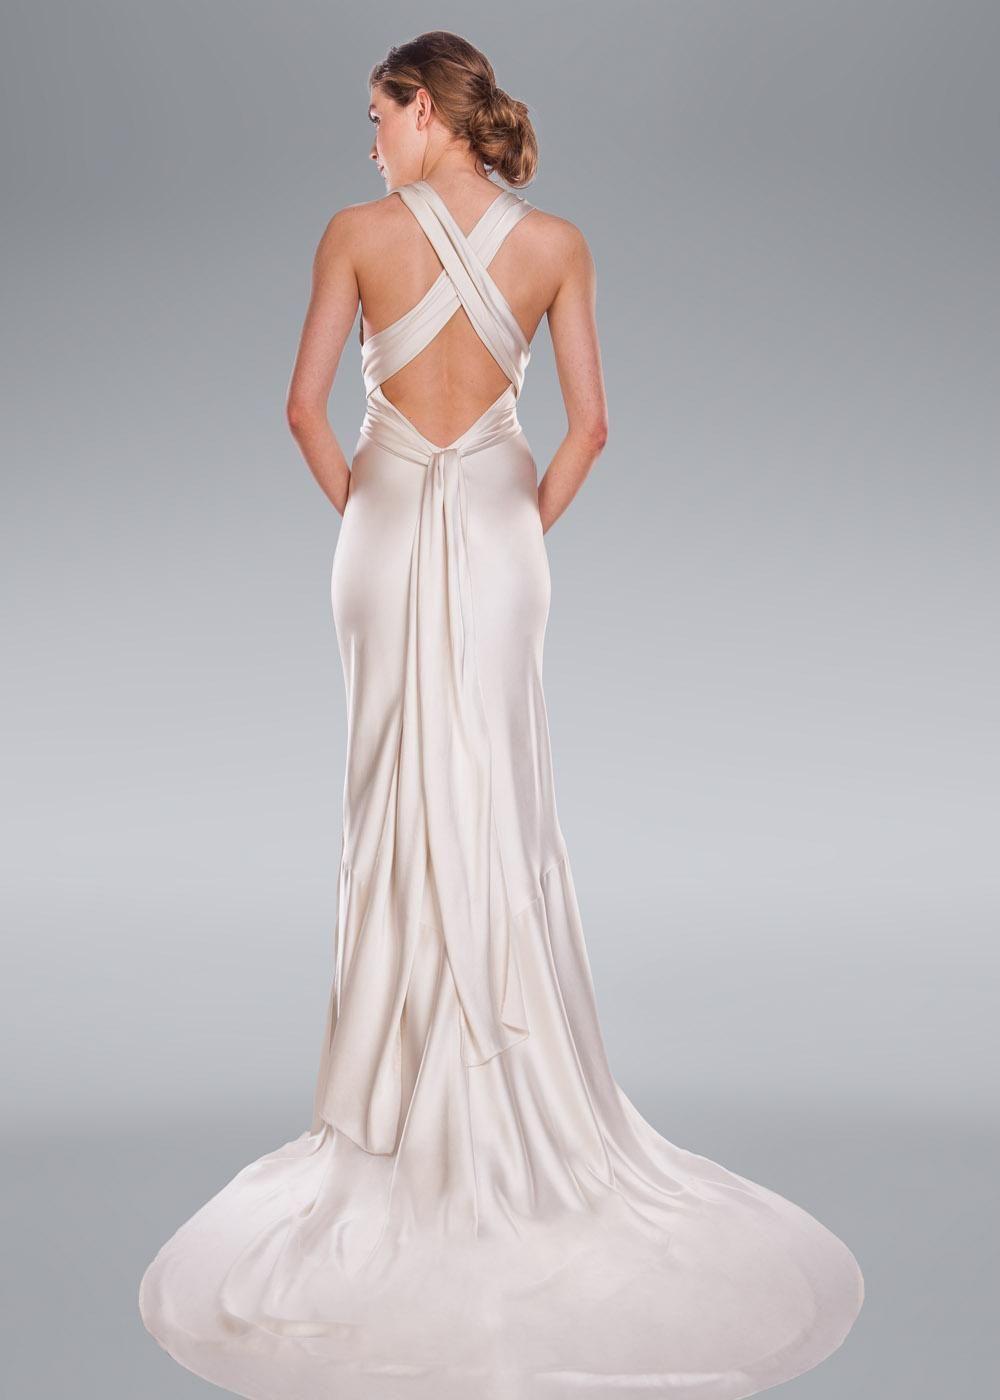 Aisha Wedding Dress, Amanda Wakeley Designer Collection   spin ...